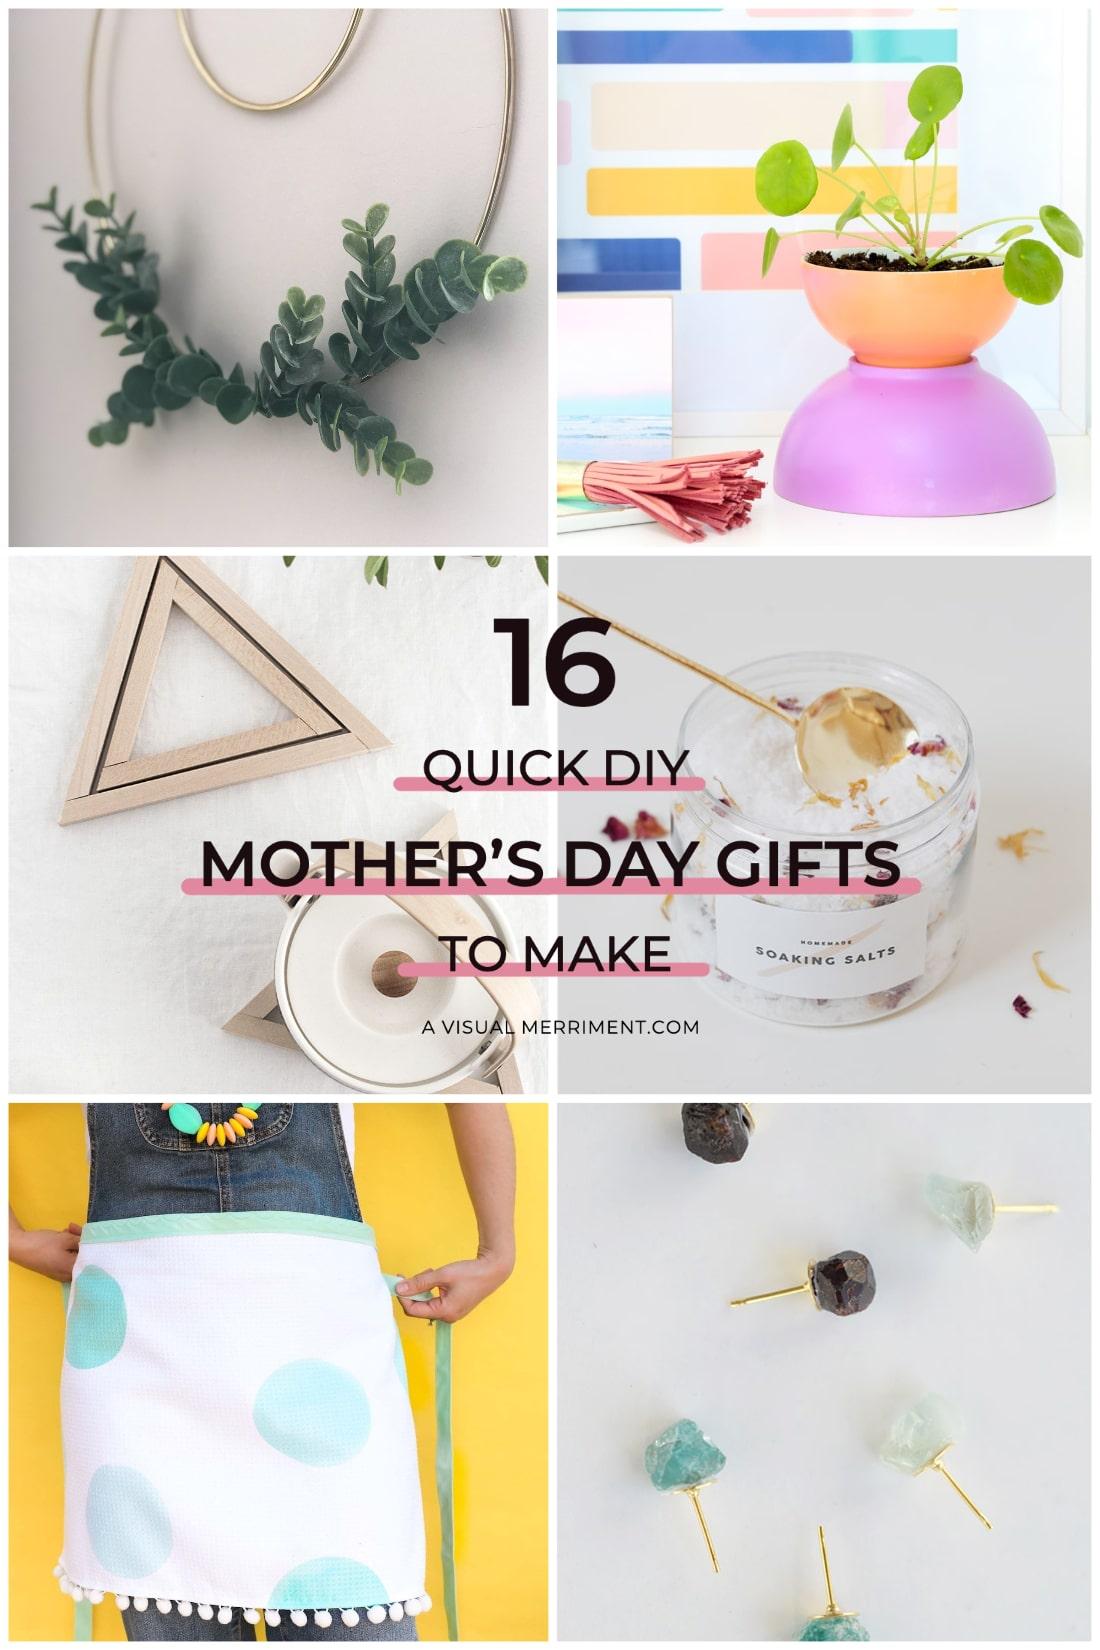 6 crafty gift ideas for mom